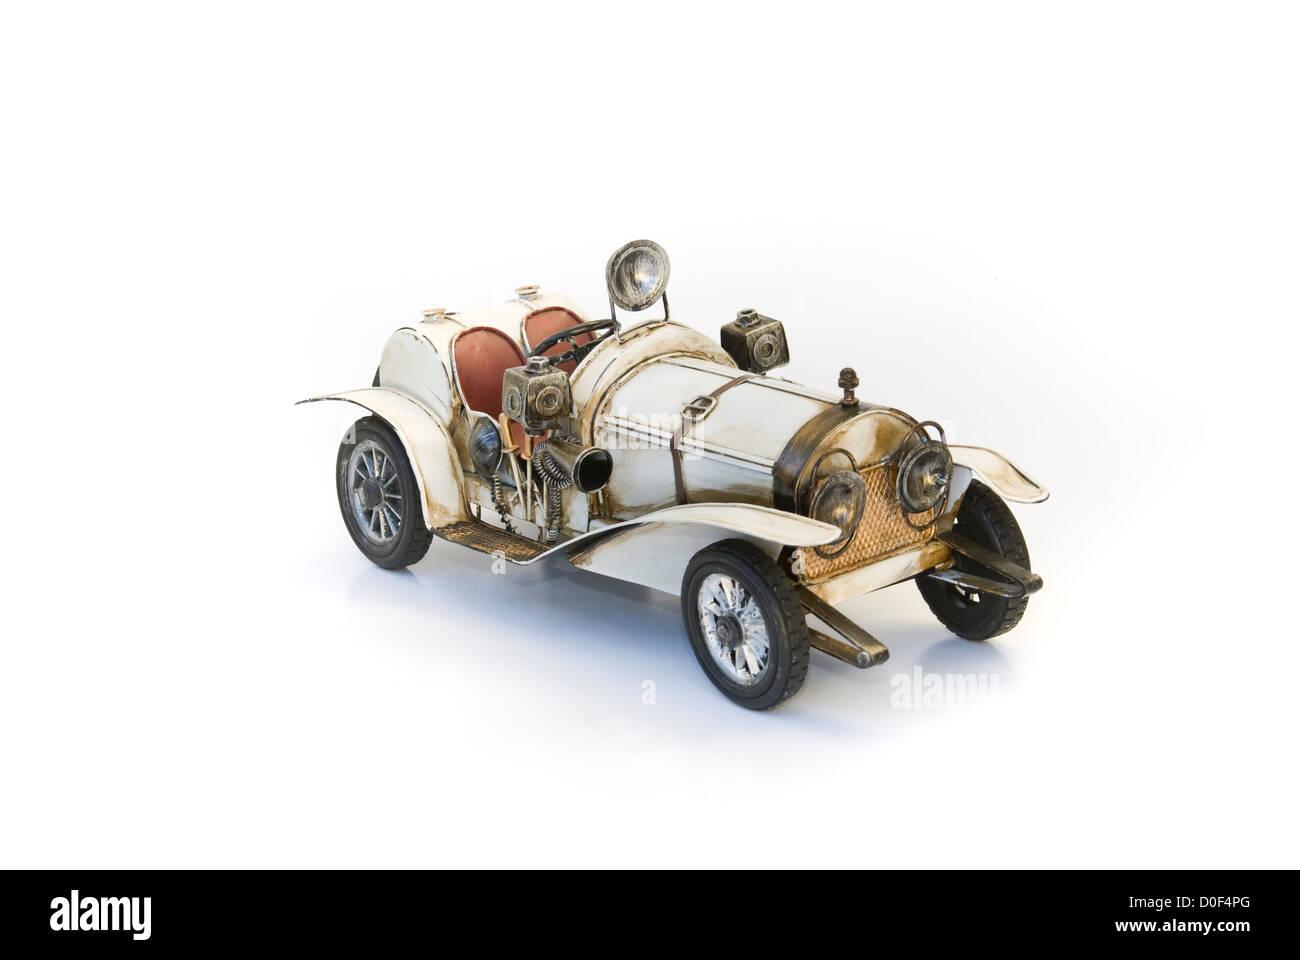 white oldtimer model at front - Stock Image